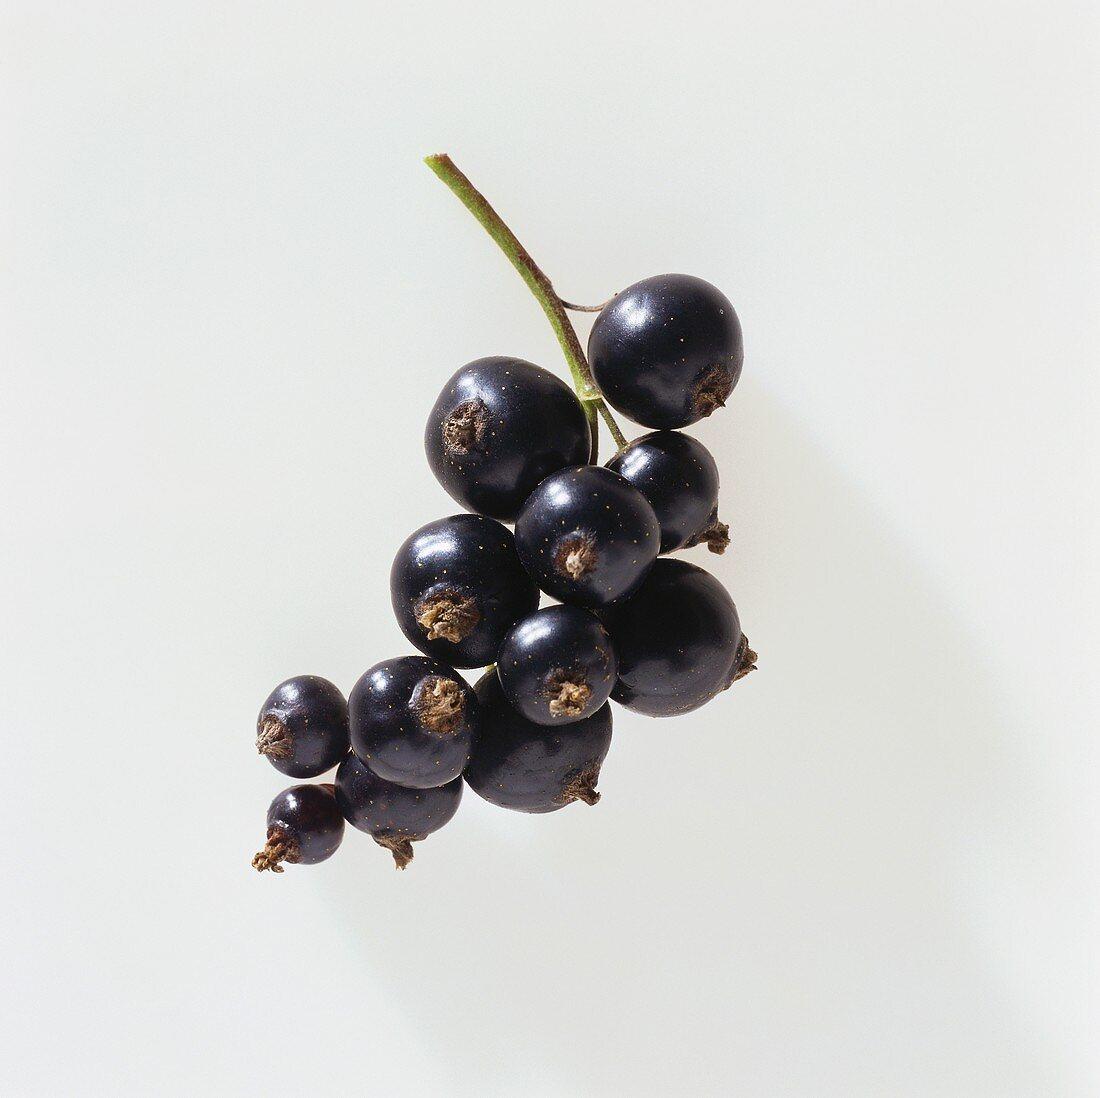 Blackcurrants on white background